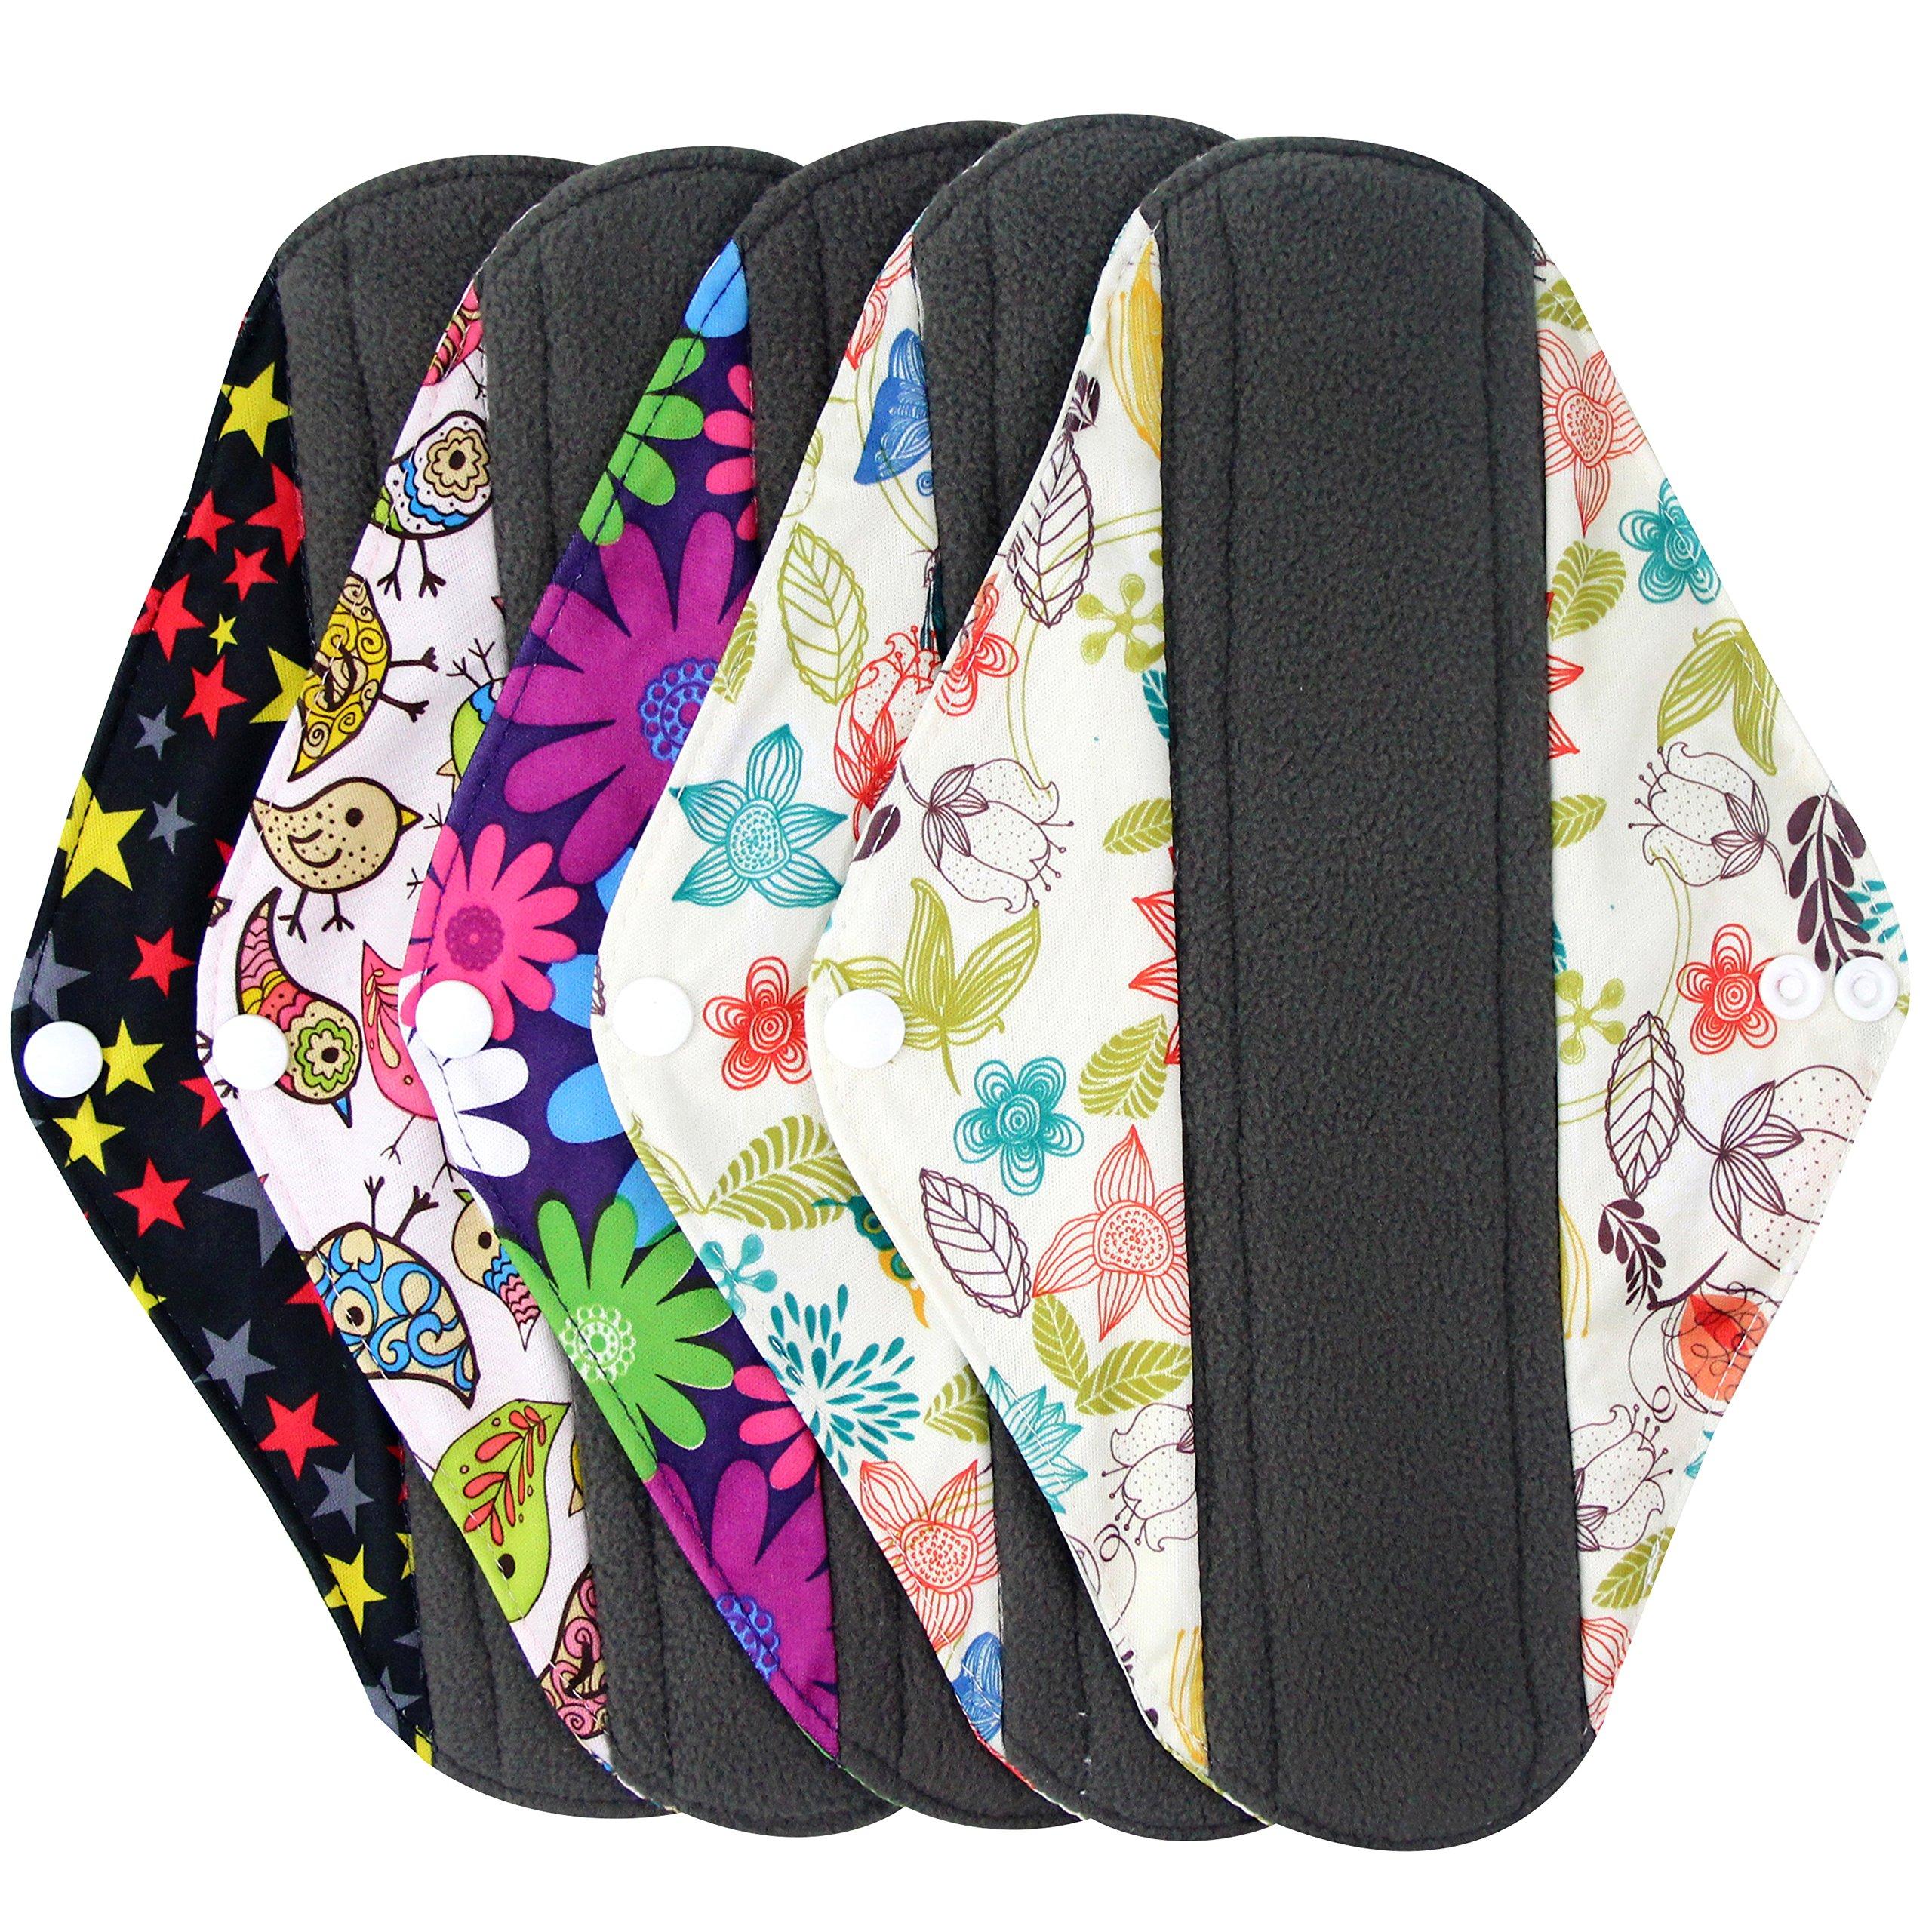 Wegreeco Bamboo Reusable Sanitary Pads - Cloth Sanitary Pads - Pack of 5 (Medium, Mix Prints)